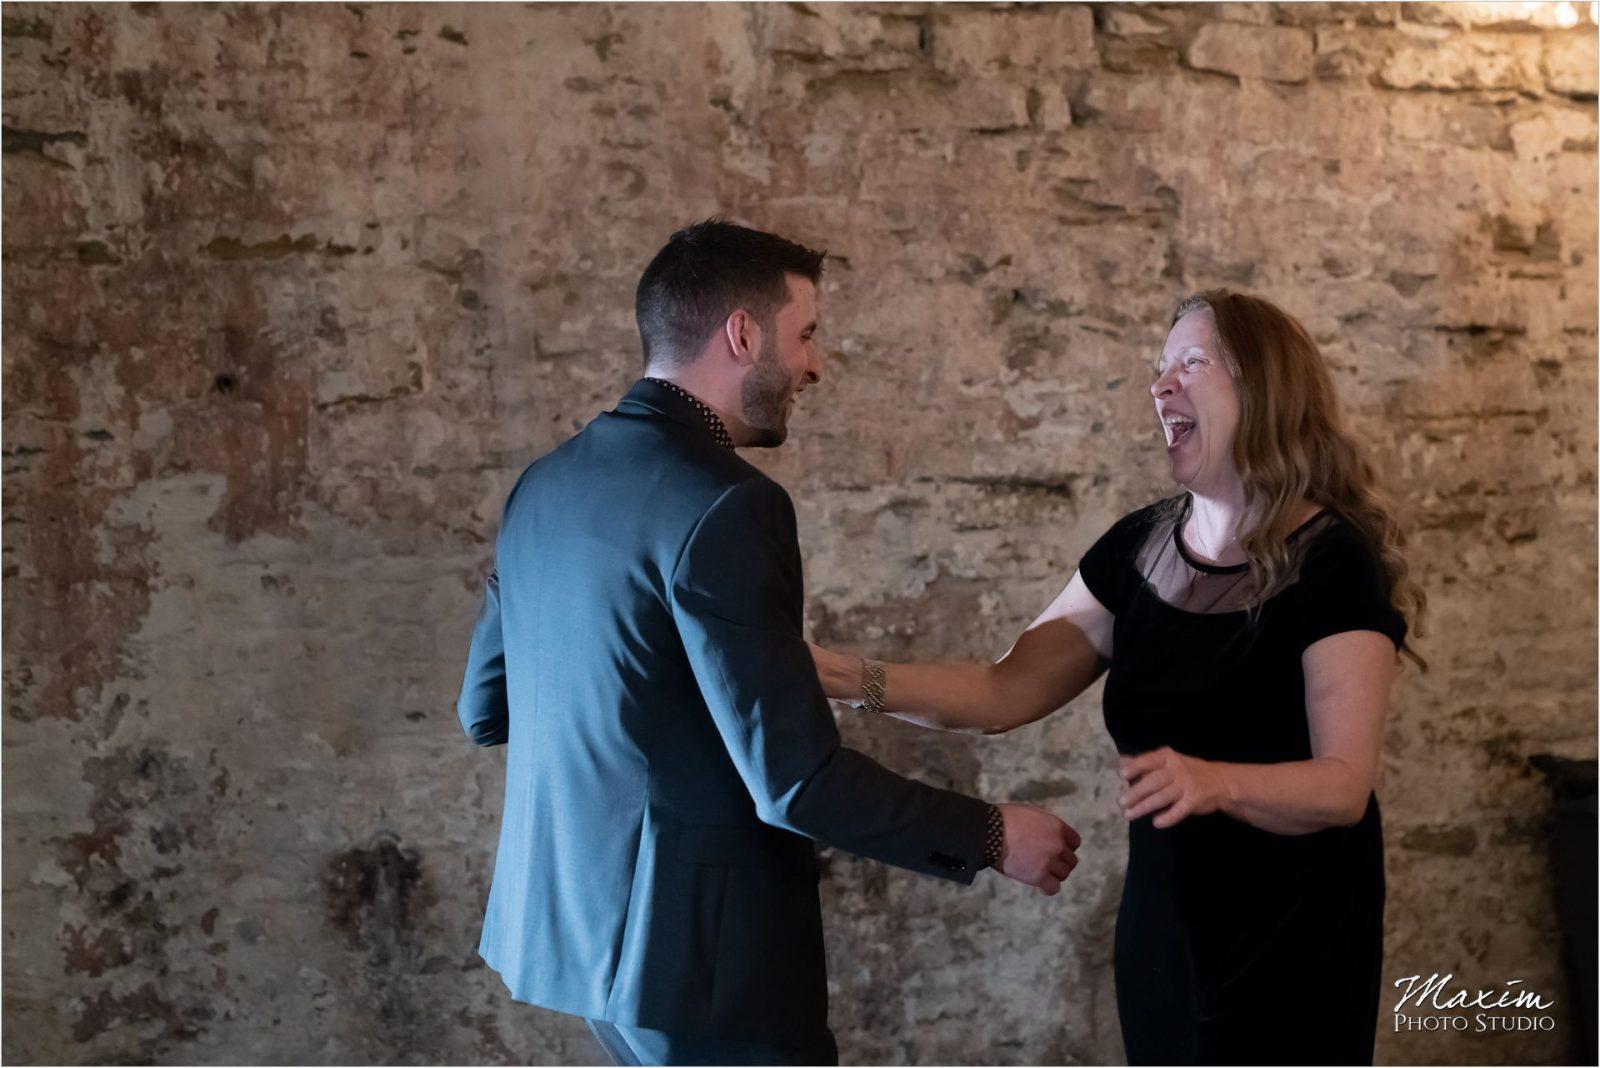 The Mockbee Cincinnati Wedding Reception Mother Son Dance